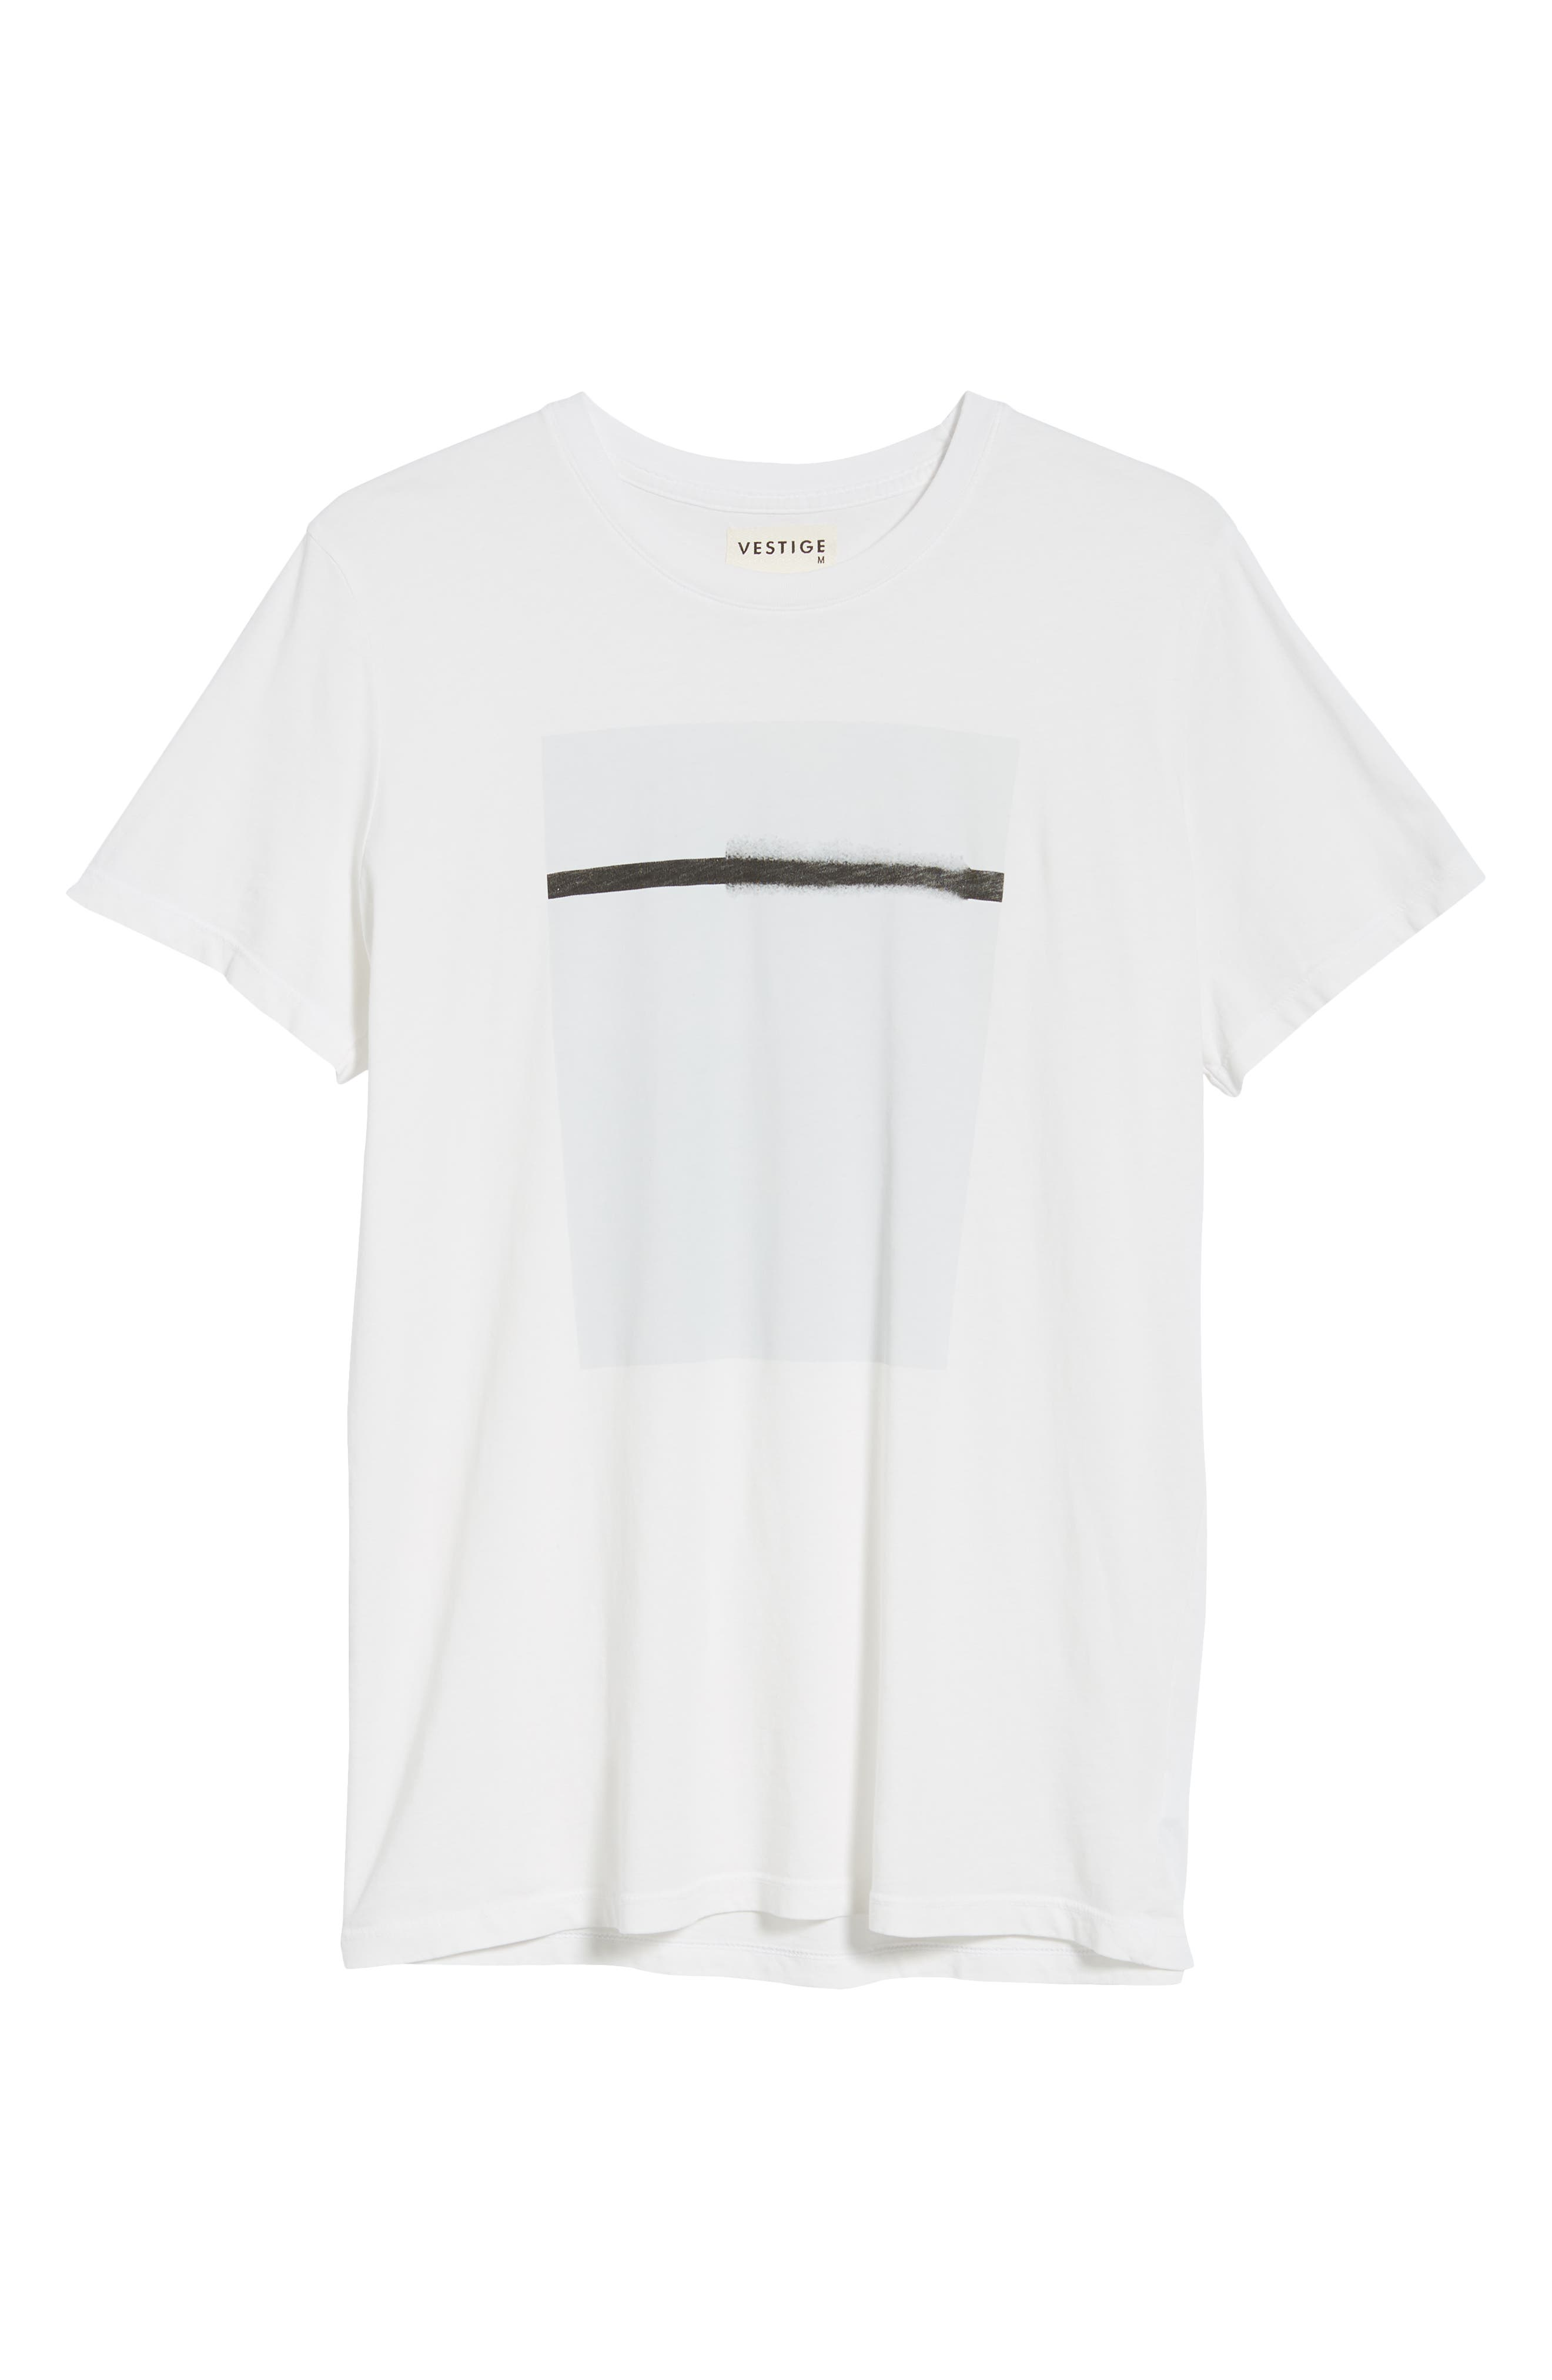 Off White Graphic T-Shirt,                             Alternate thumbnail 6, color,                             WHITE